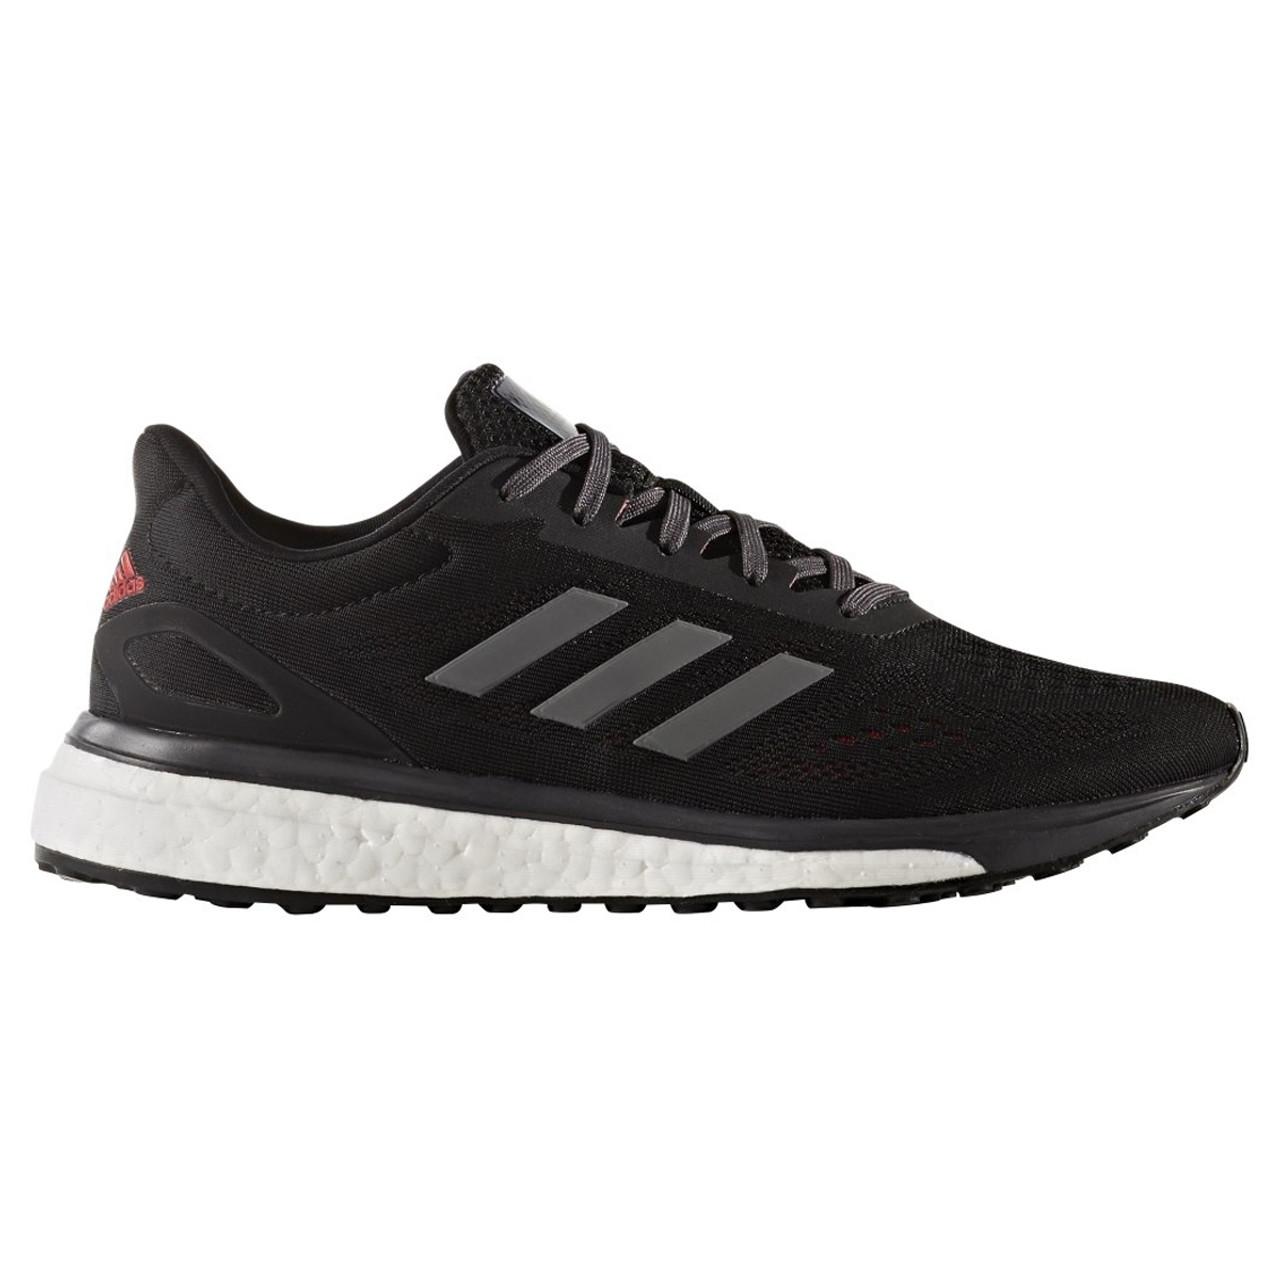 Adidas Sonic Drive Women's Running Shoes BB3424 - Black, Iron